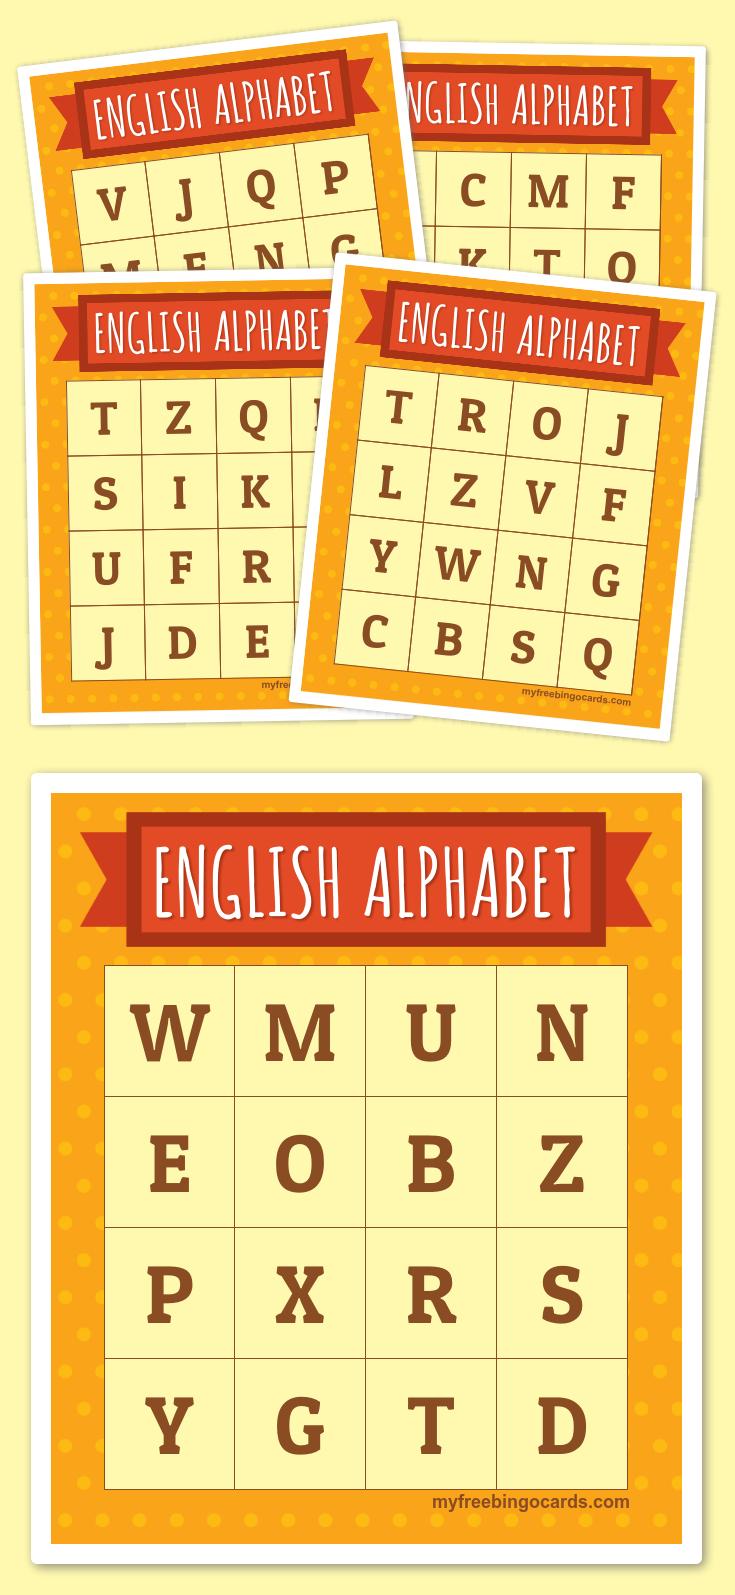 English Alphabet Bingo